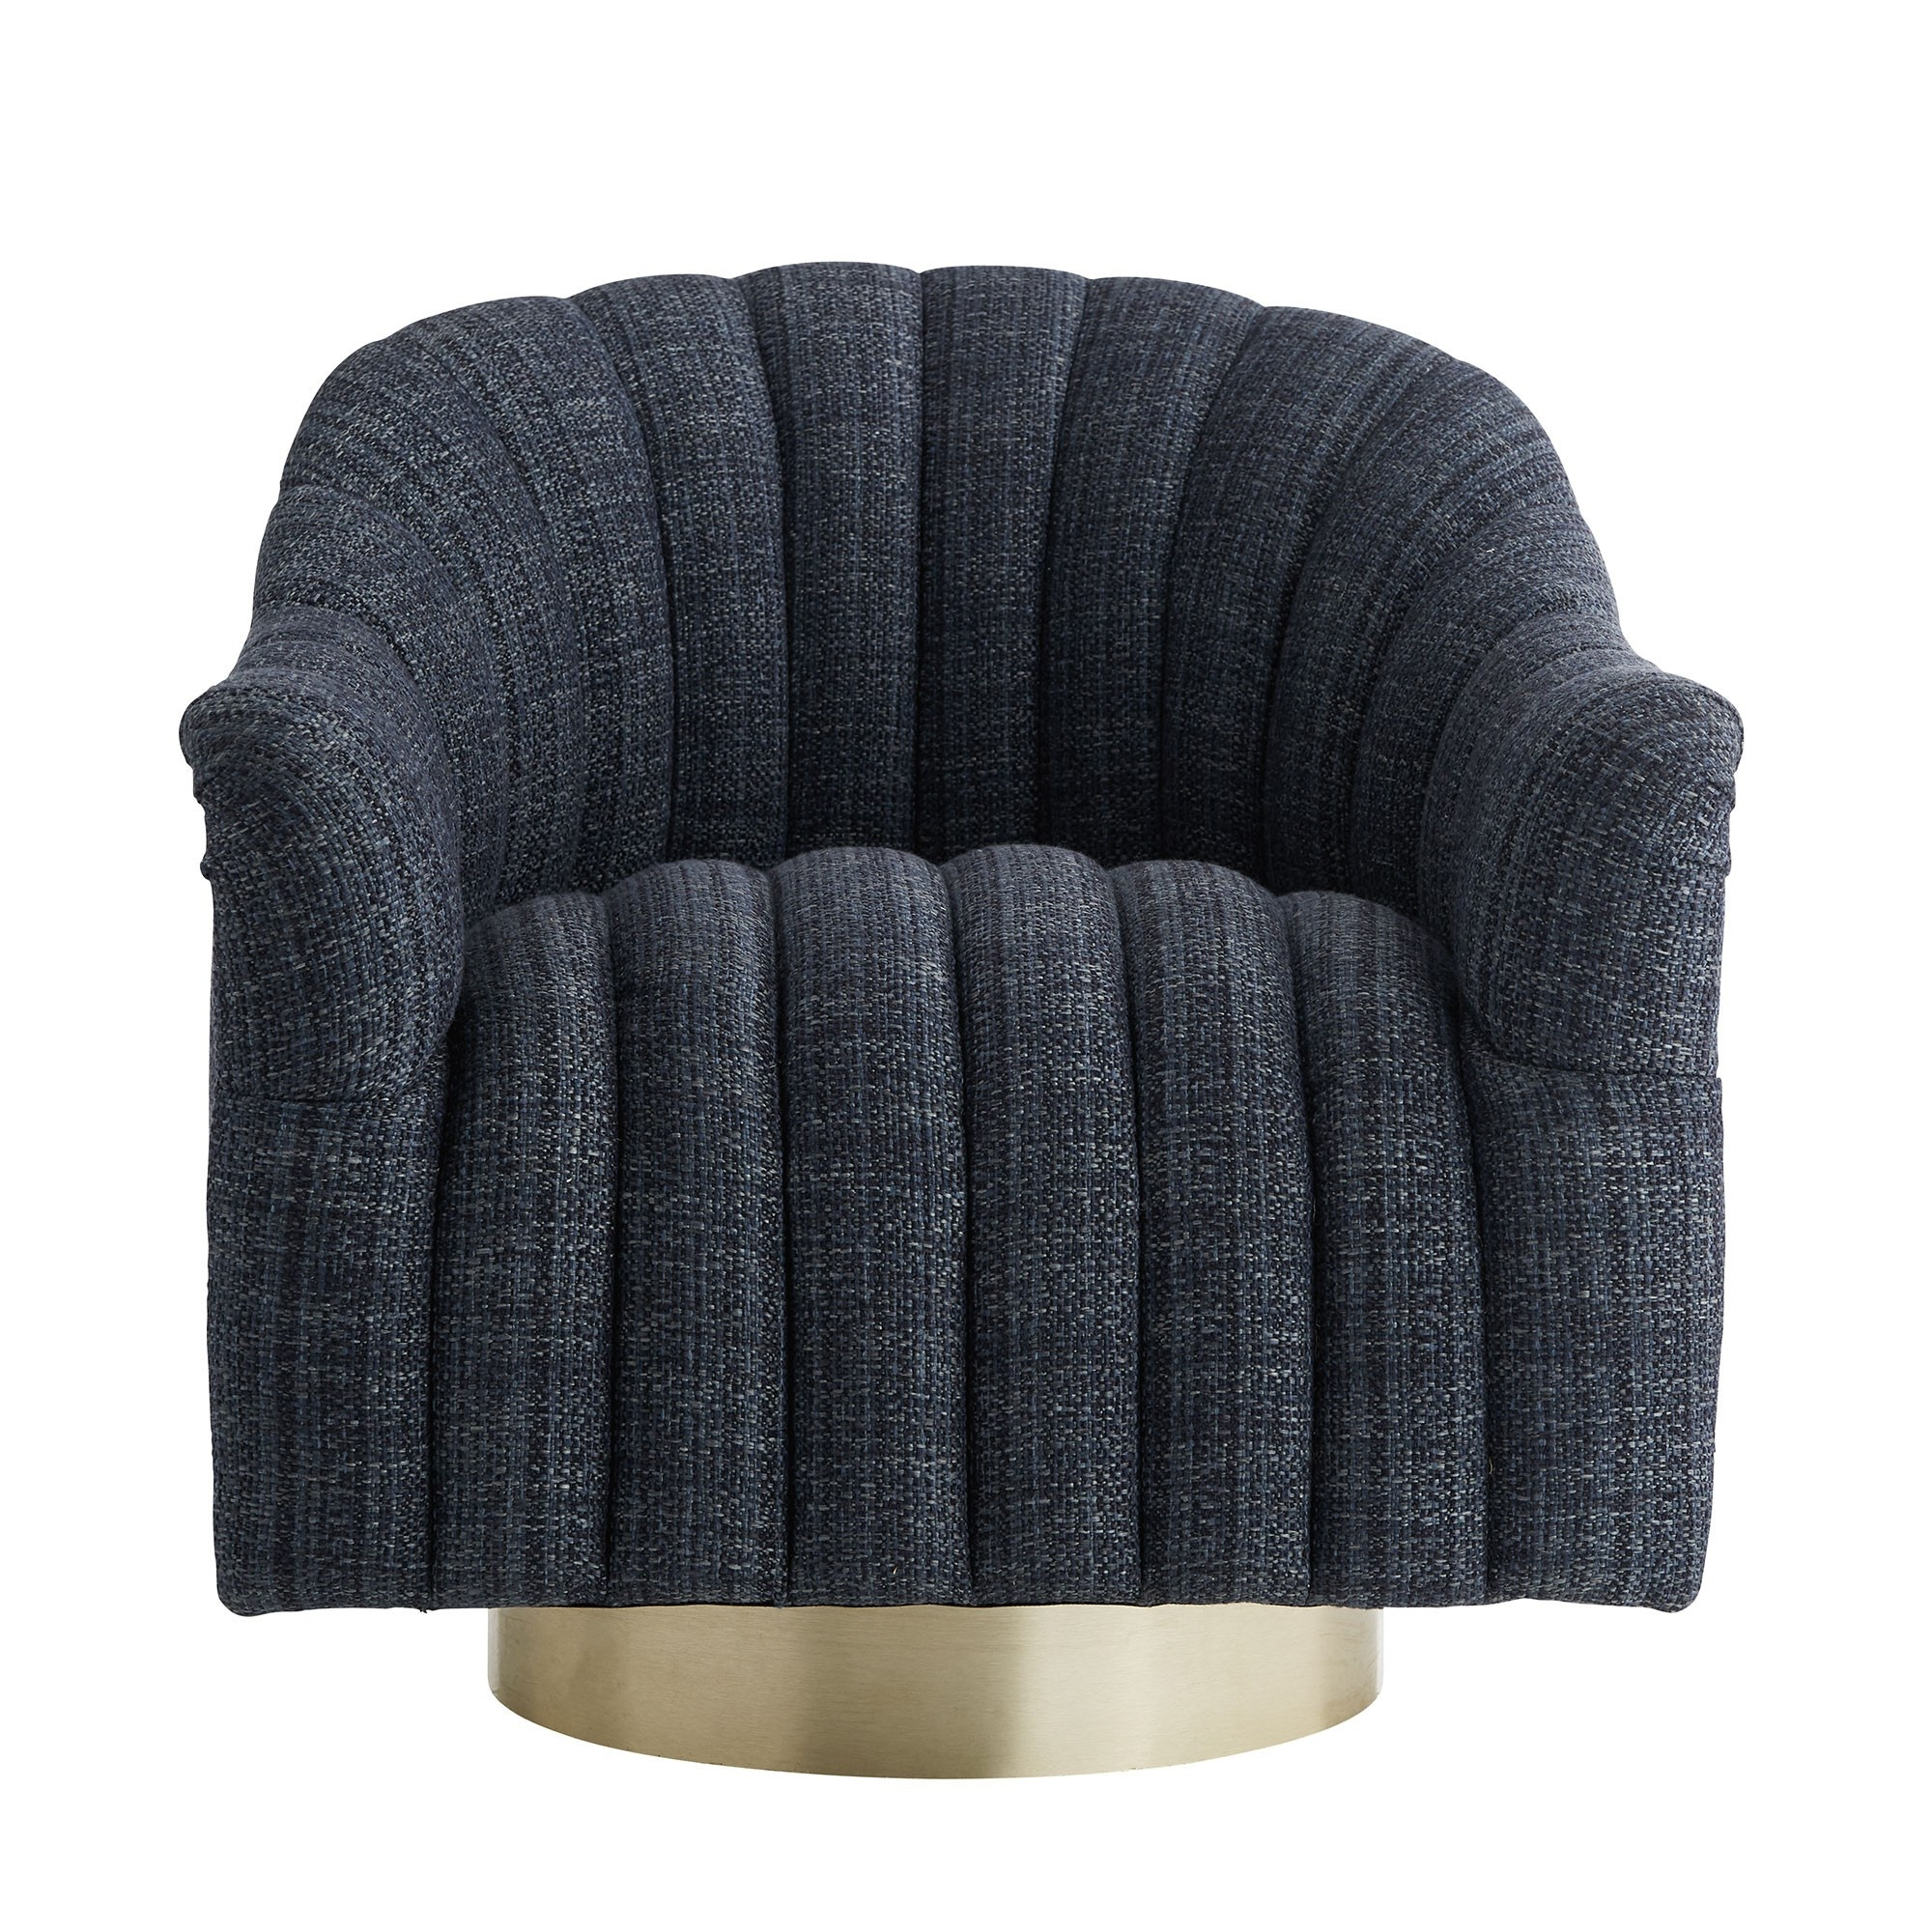 Springsteen Chair